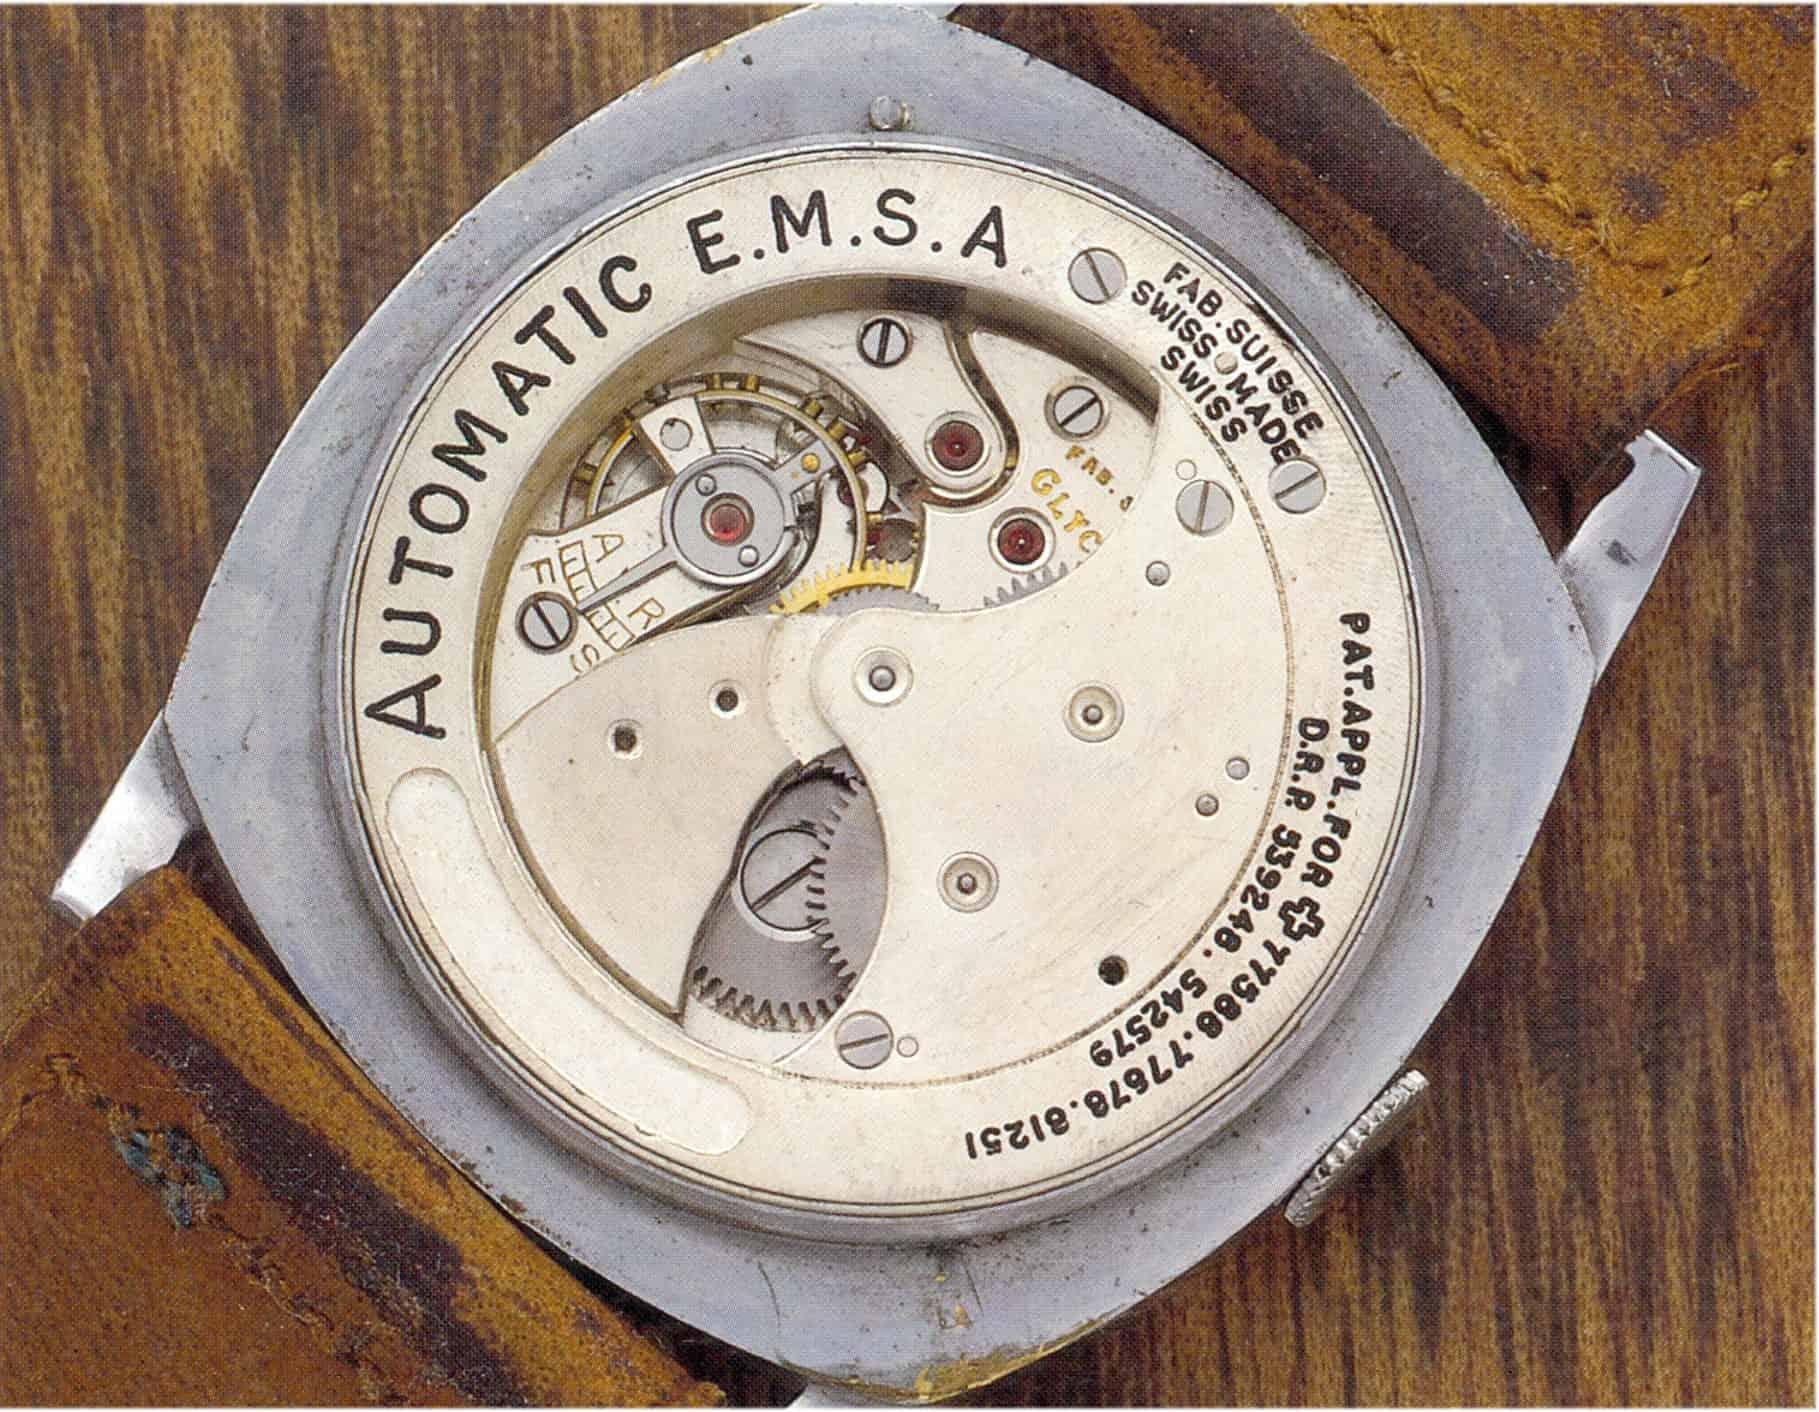 Glycine Automatic EMSA kleine Sekunde - Kaliber 35